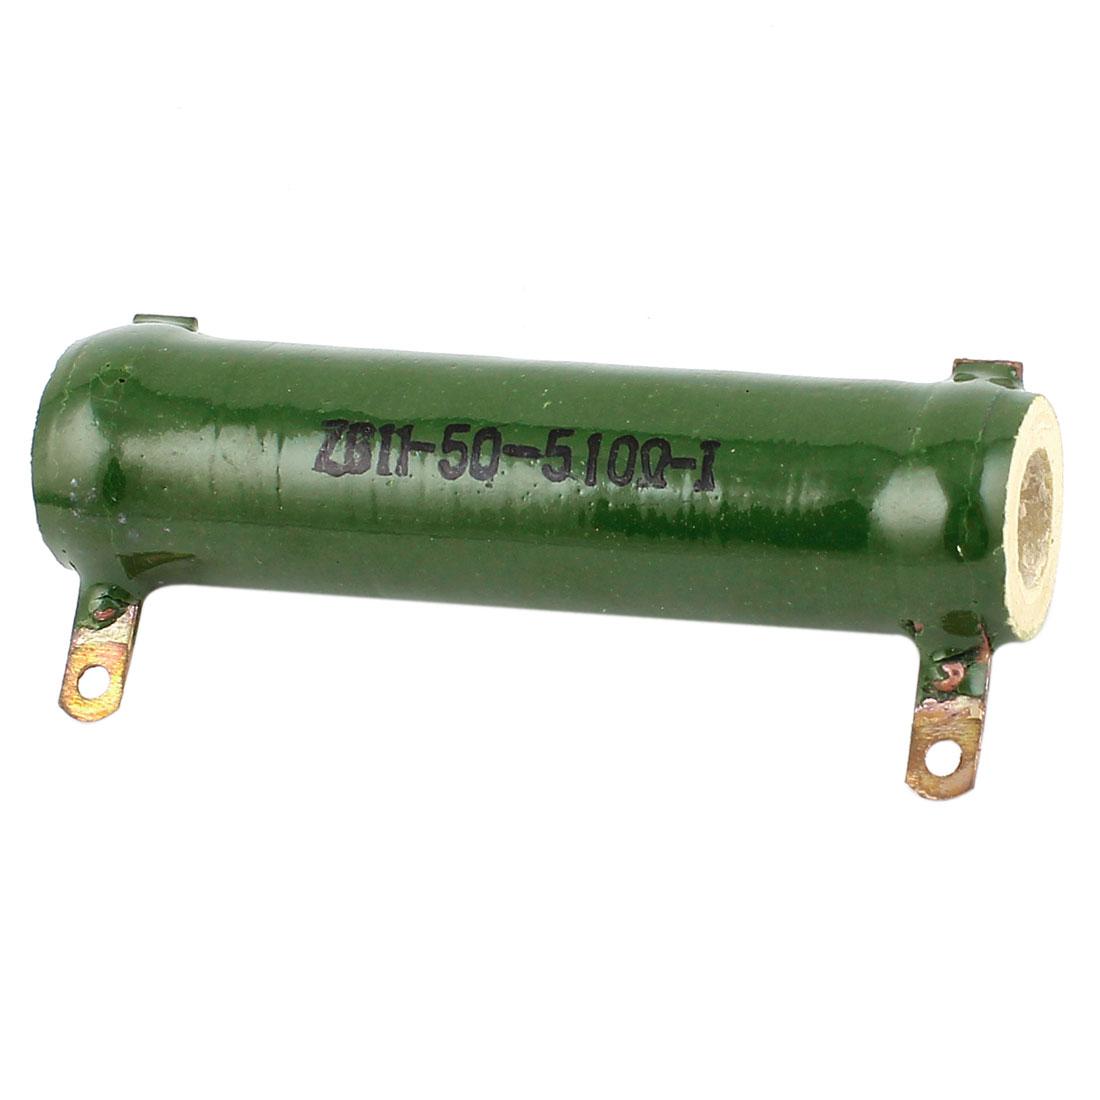 Ceramic Tube 50W Watt 510 Ohm 5% Tolerance Fixed Wirewound Resistor